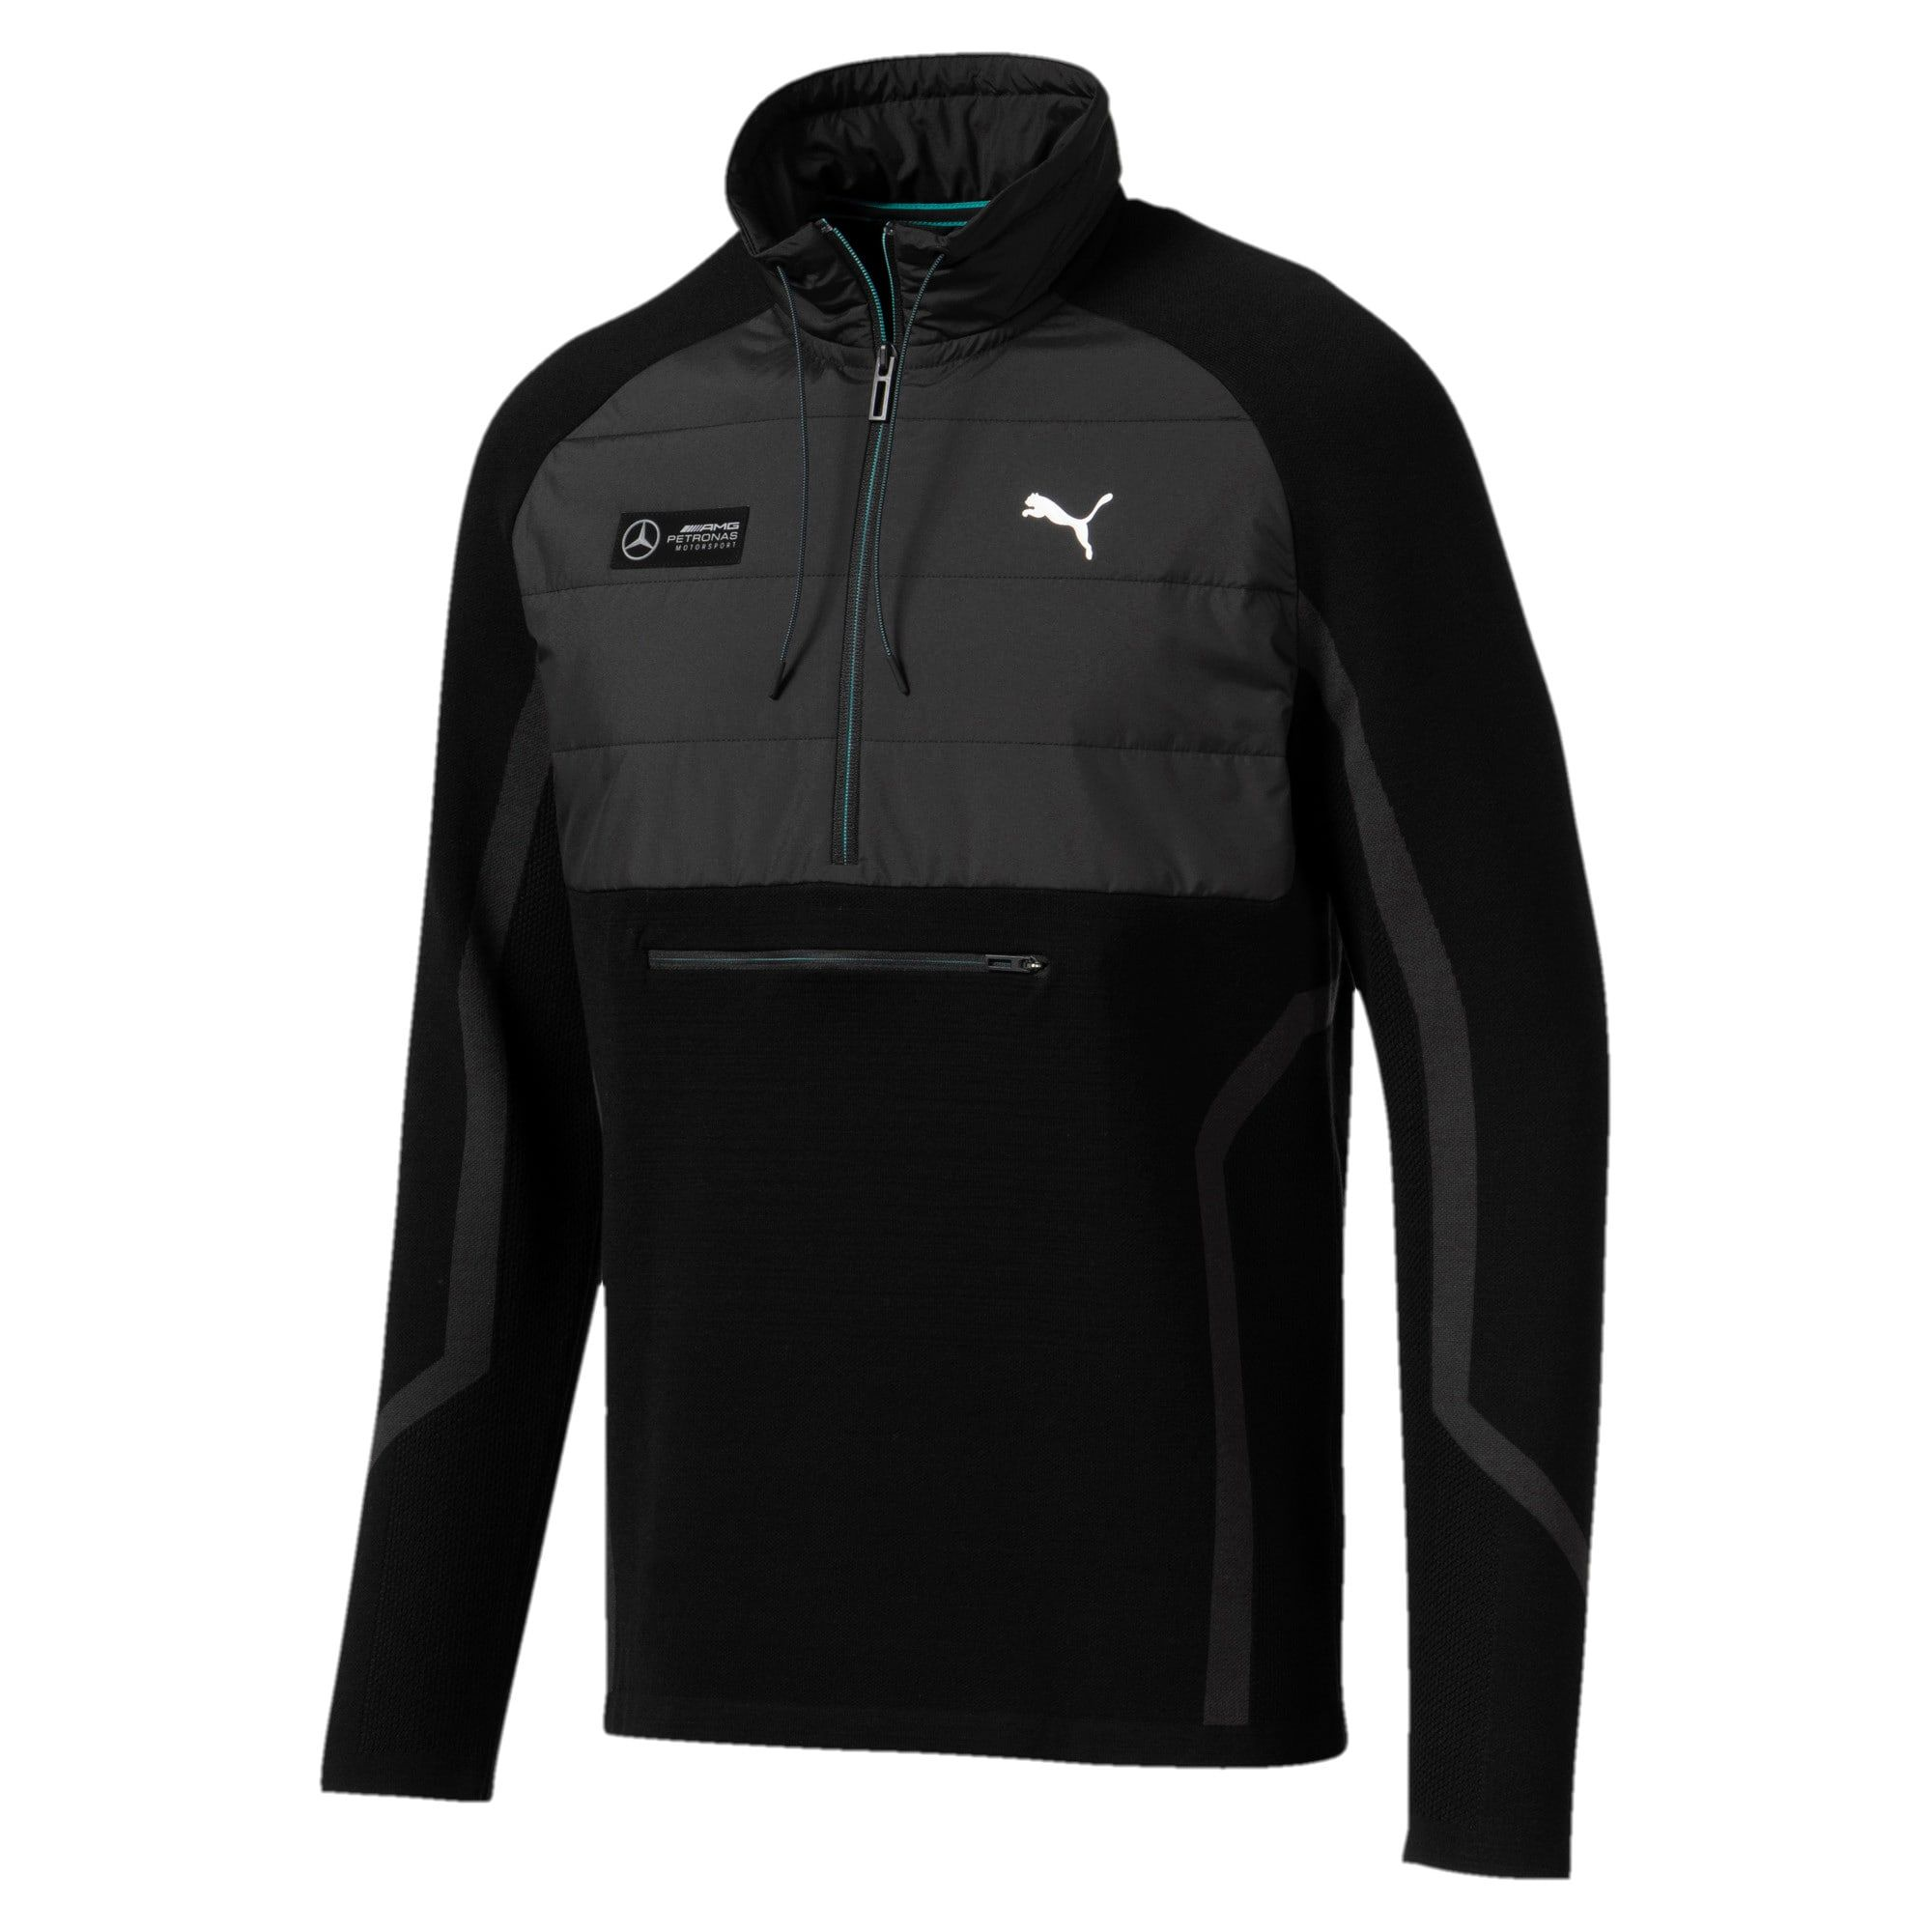 Mercedes AMG Petronas RCT evoKNIT Knitted Men's Sweater | PUMA Mercedes AMG Petronas | PUMA United Kingdom #mercedesamg